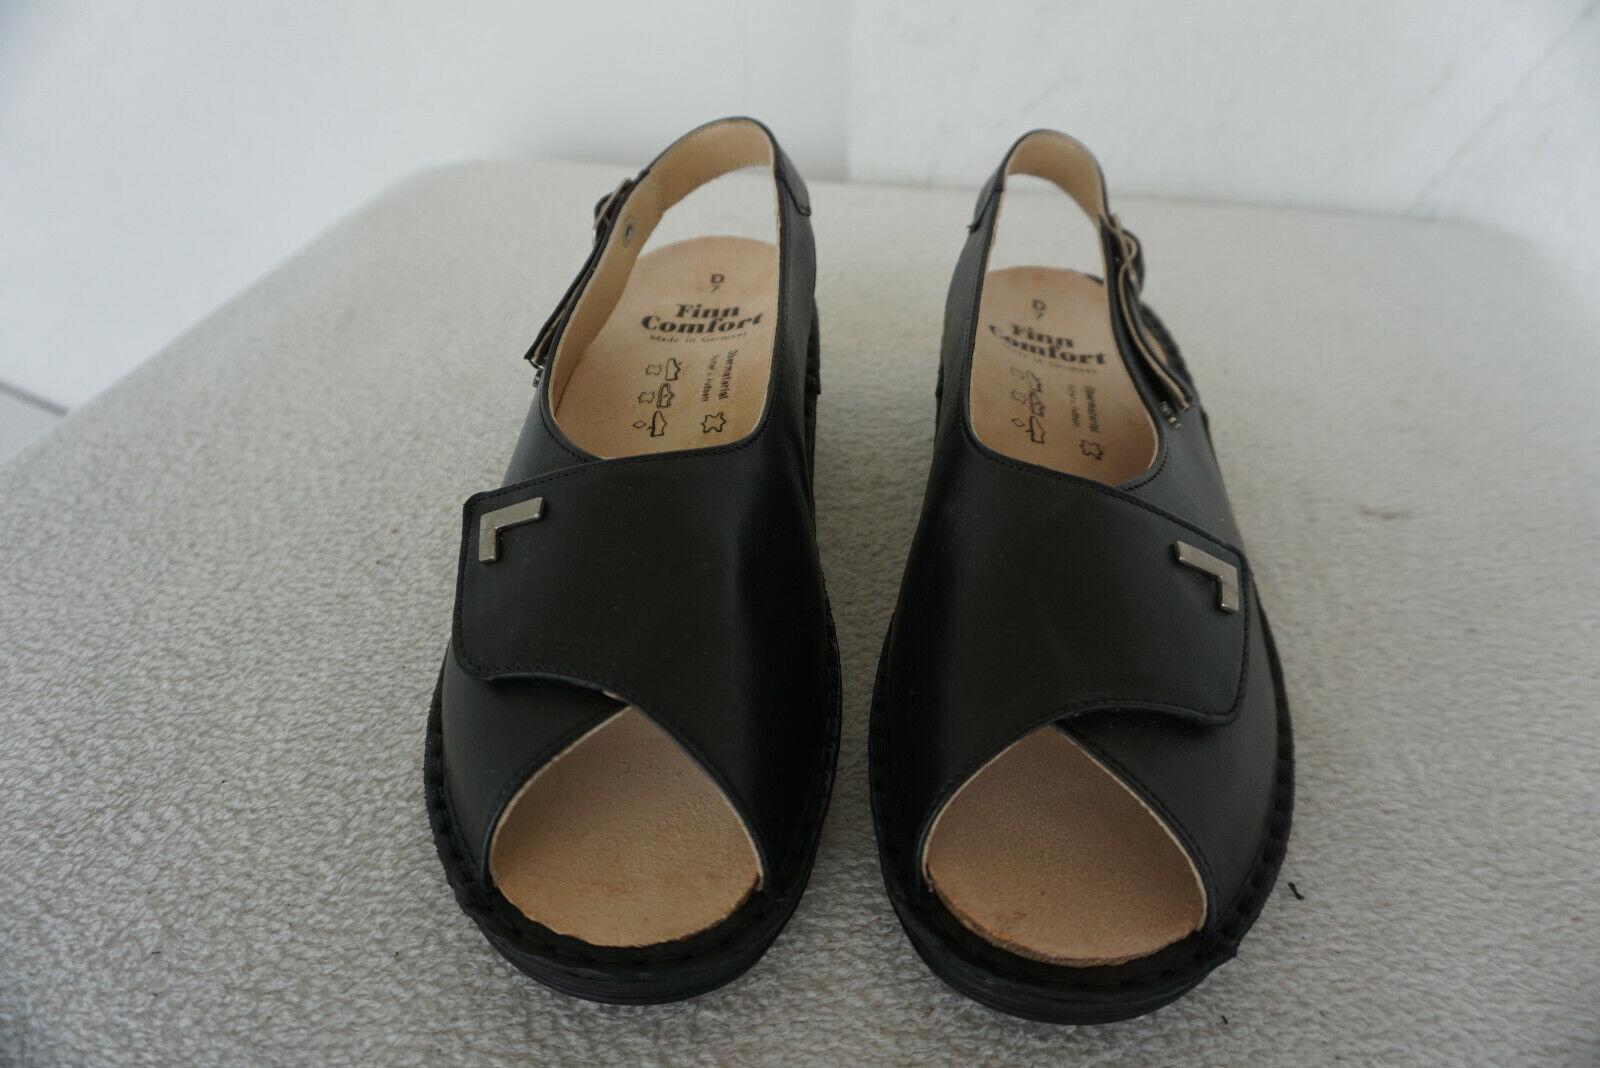 FINN COMFORT MADEIRA Sommer schuhe Sandale Einlagen Gr.7  40,5 Schwarz Leder NEU